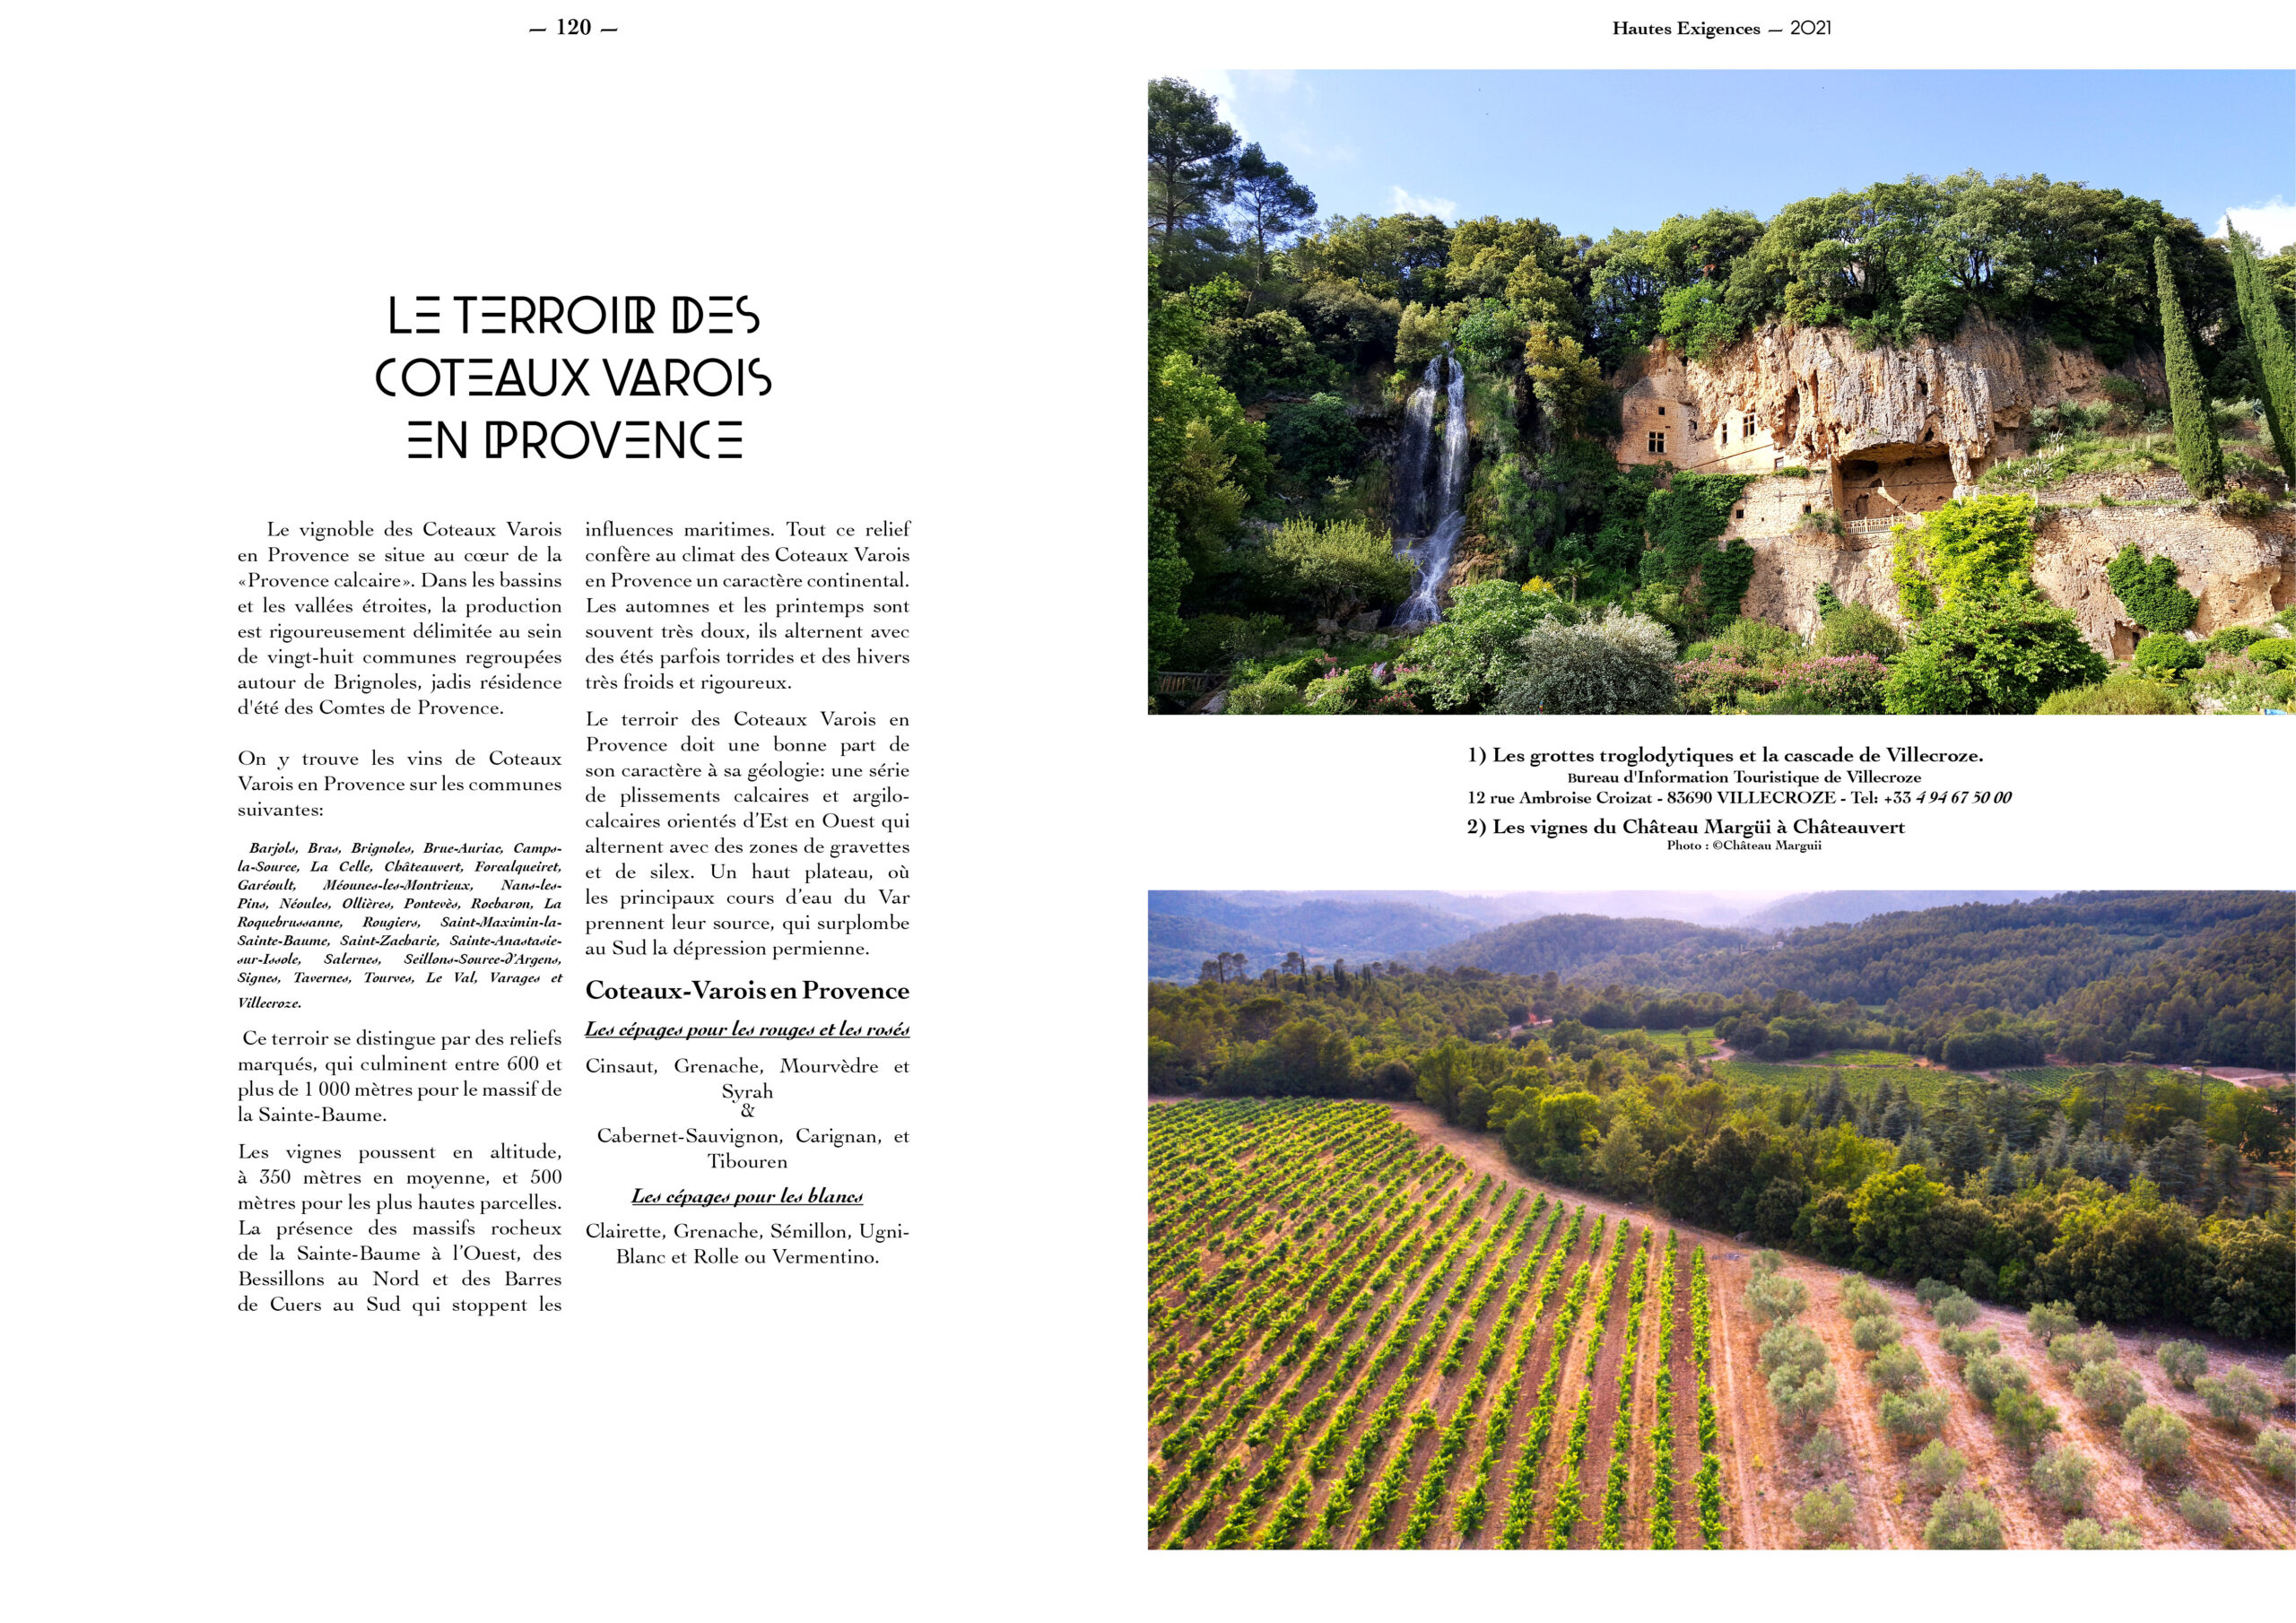 Hautes Exigences Magazine Hors Serie 2021 page 118-119